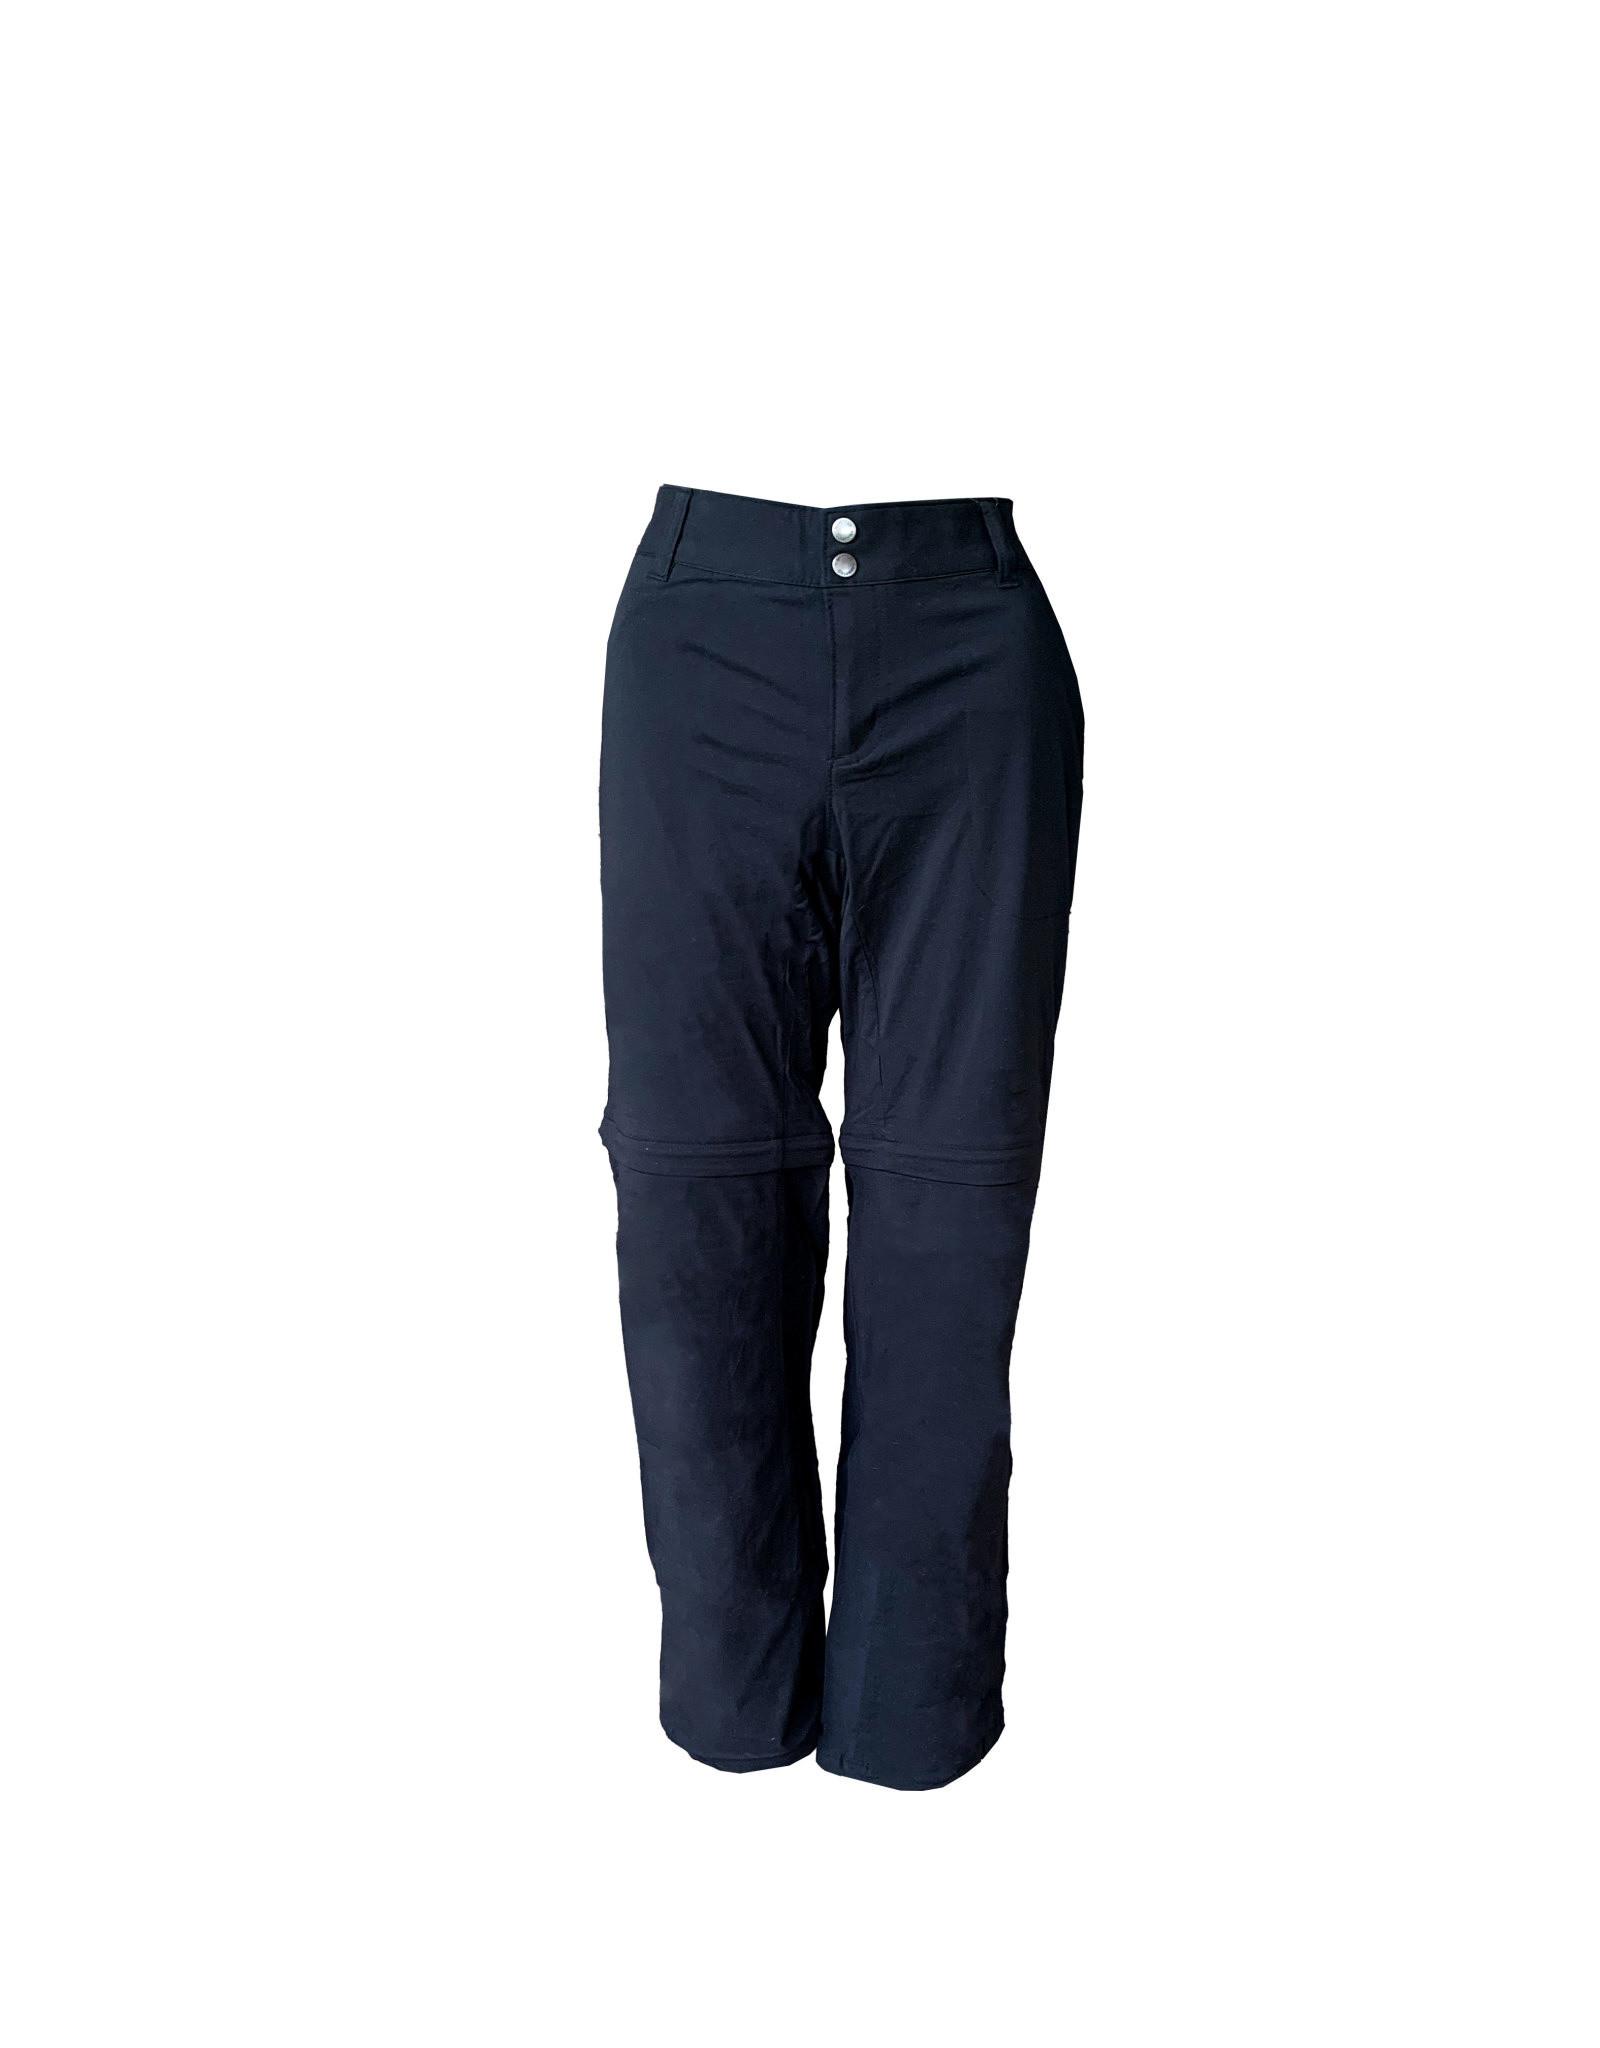 Columbia COLUMBIA   Stright  Leg  Pants  Size 10